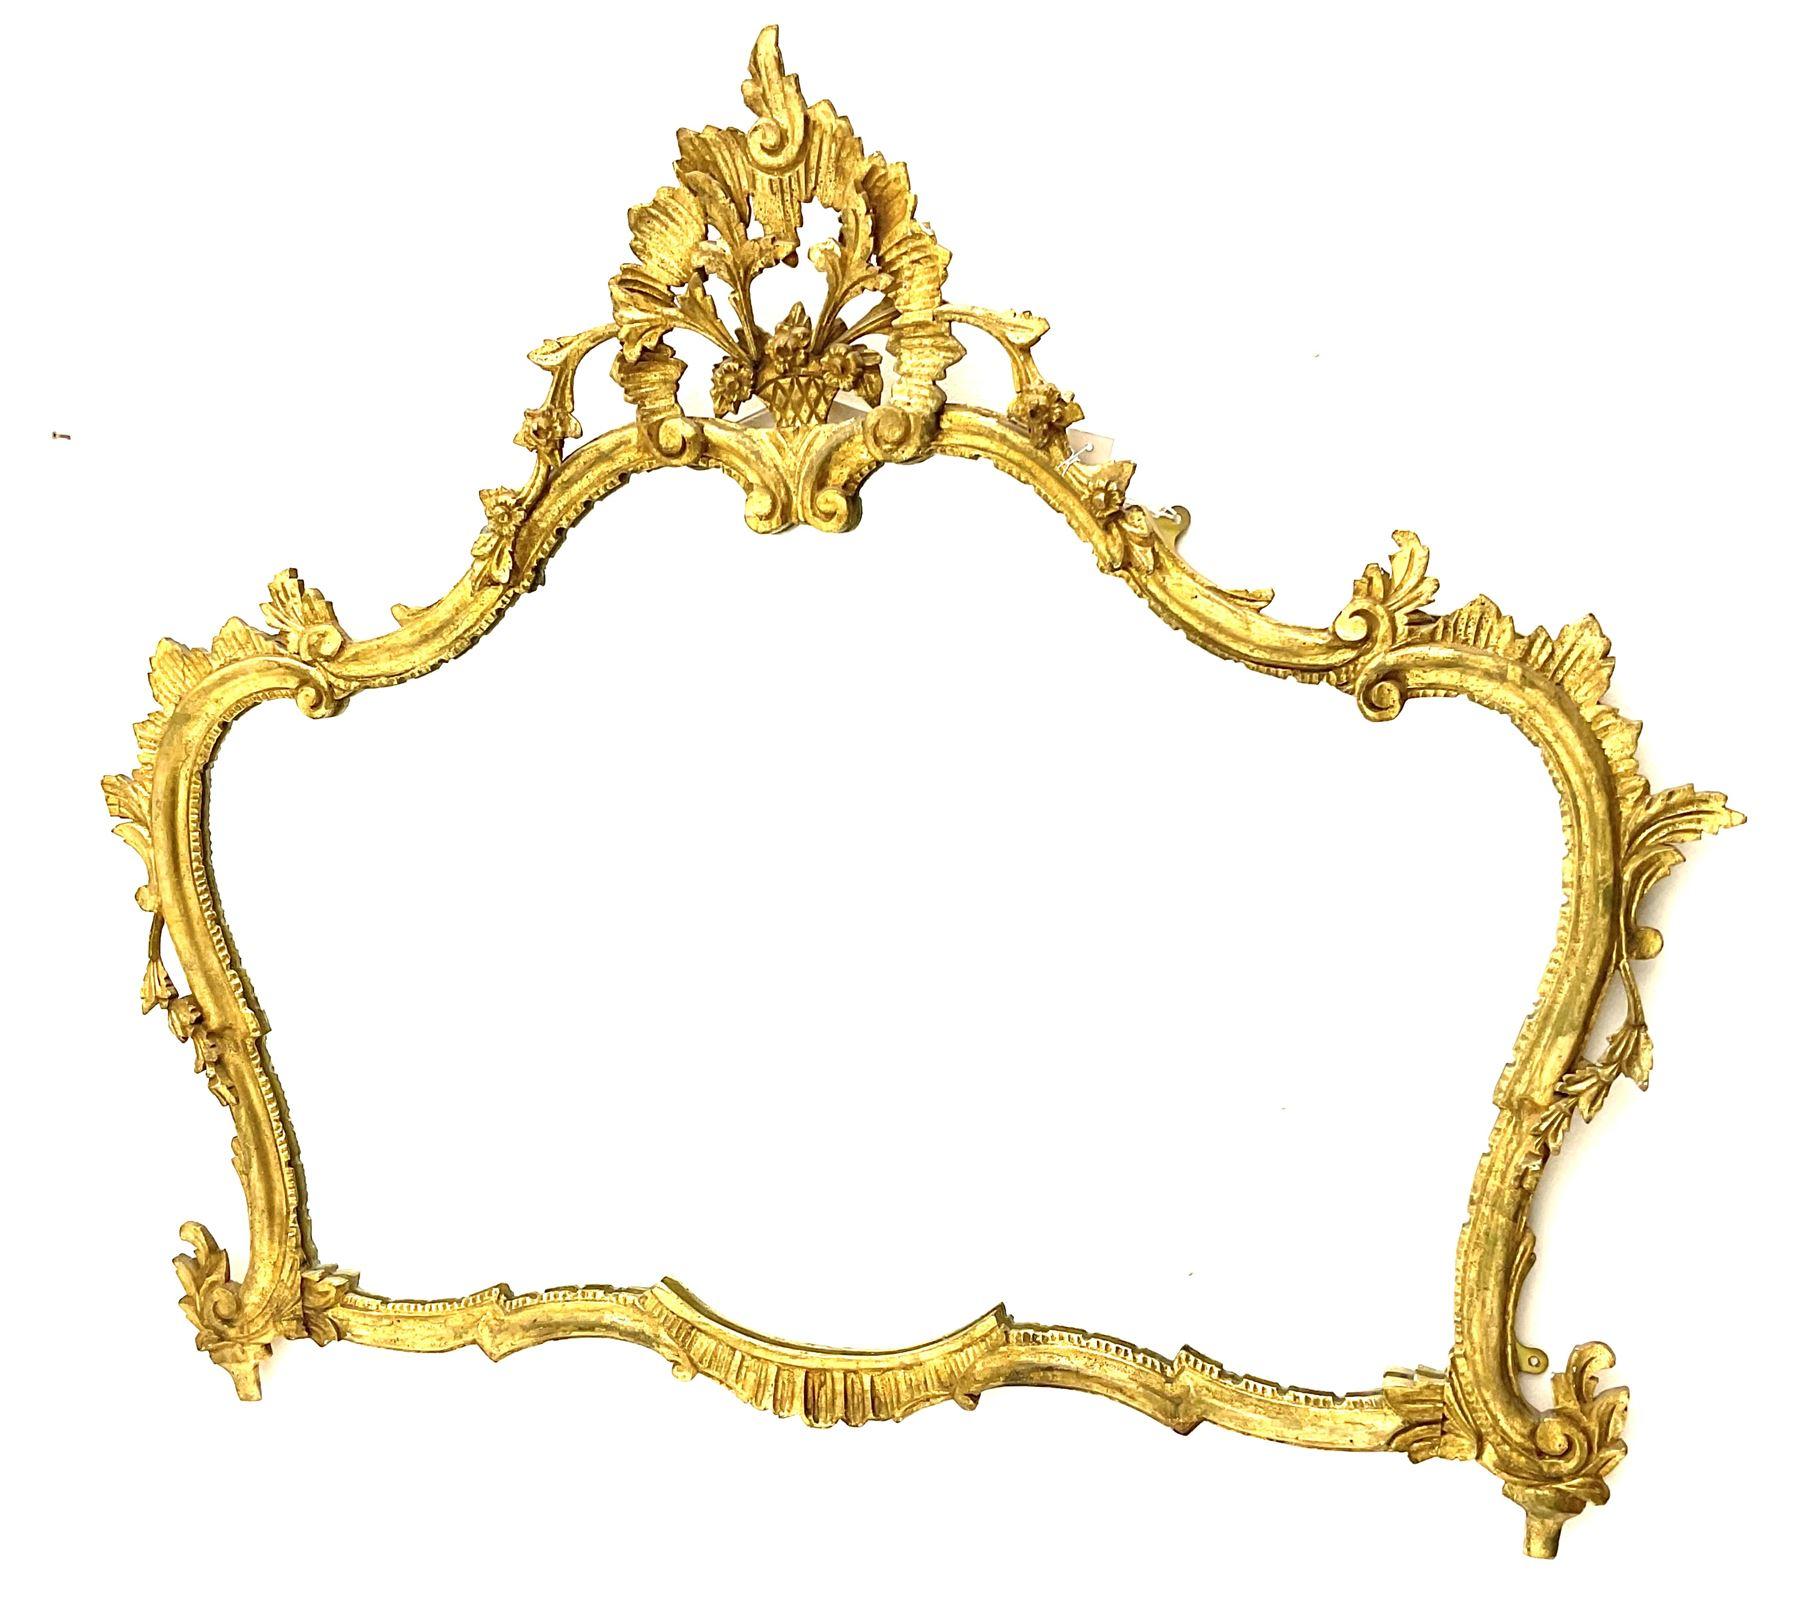 Classical ornate gilt framed shaped wall mirror